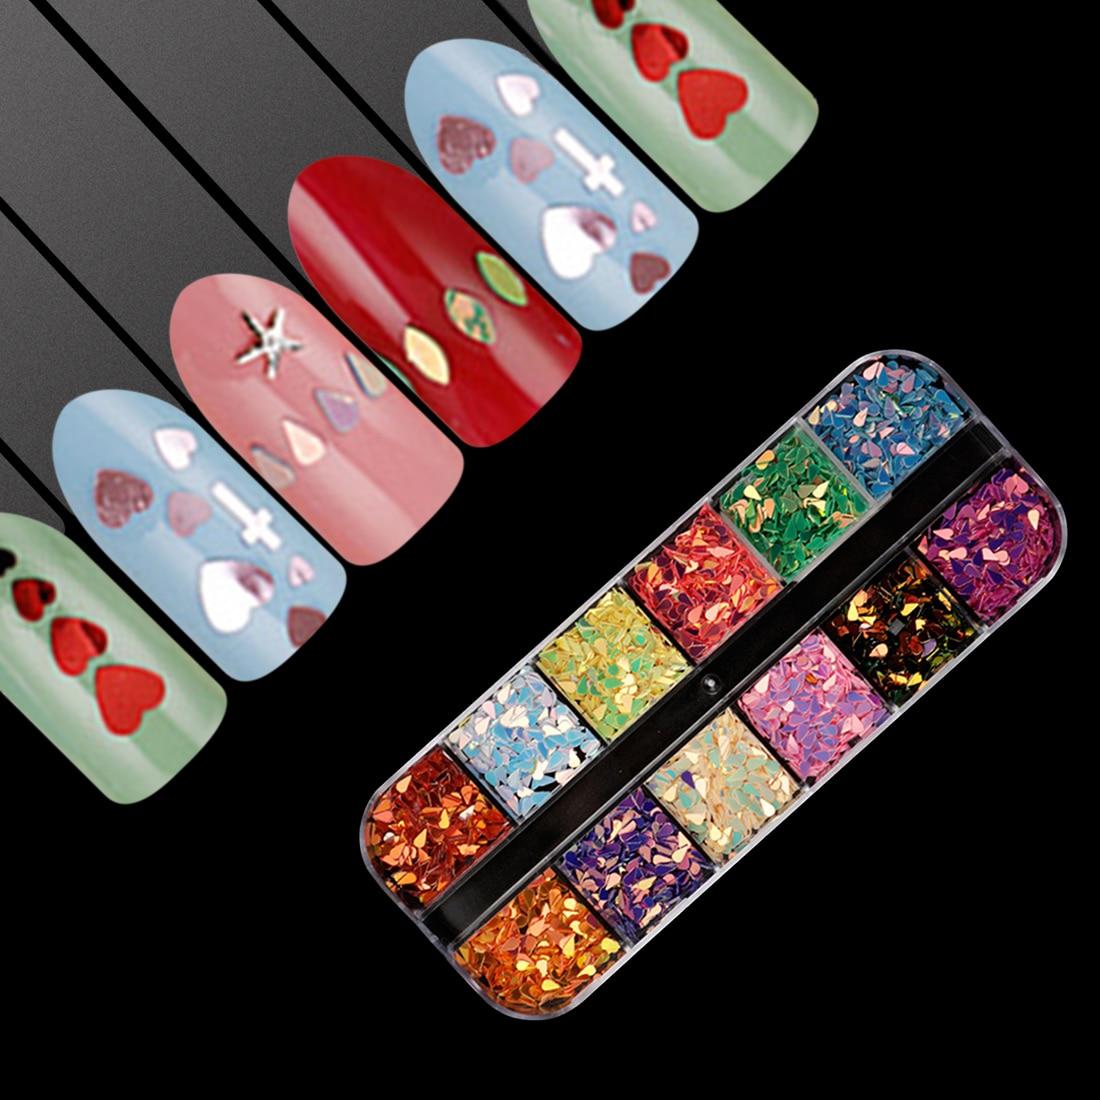 Nagel Glitter Pailletten 1 Fall 12 Grids Diy Kit Hourse Auge Waterdrop Herz Kreuz Caviar Paillette 3d Flakes Nail Art Dekoration Angenehme SüßE Nagelglitzer